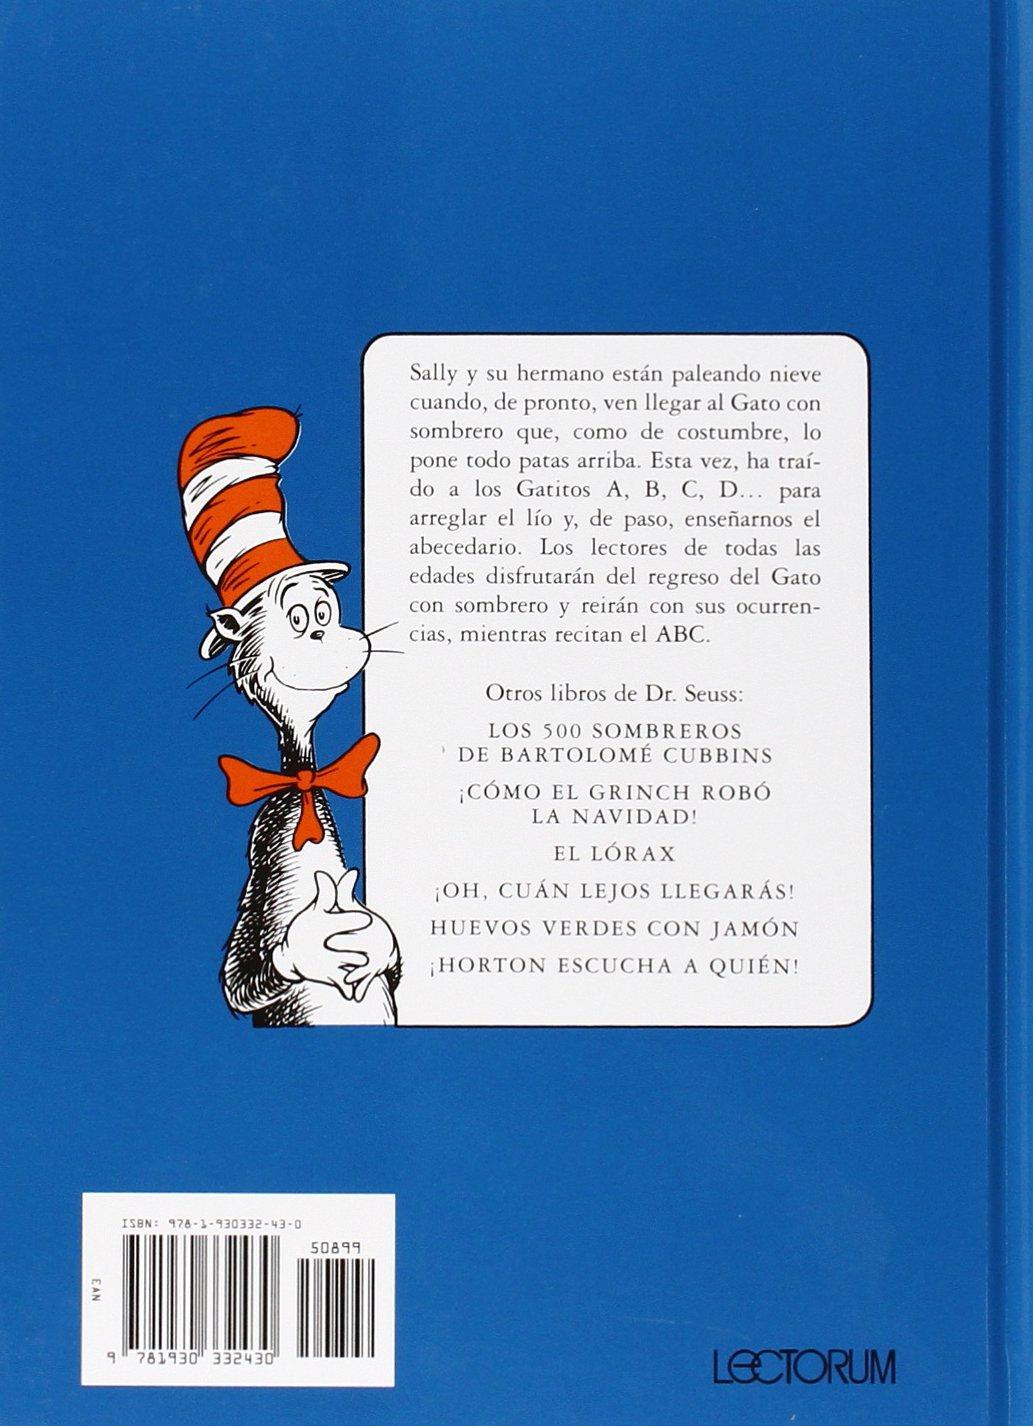 Amazon.com: El gato con sombrero viene de nuevo (I Can Read It All by  Myself Beginner Books (Hardcover)) (Spanish Edition) (9781930332430): Dr.  Seuss, ...